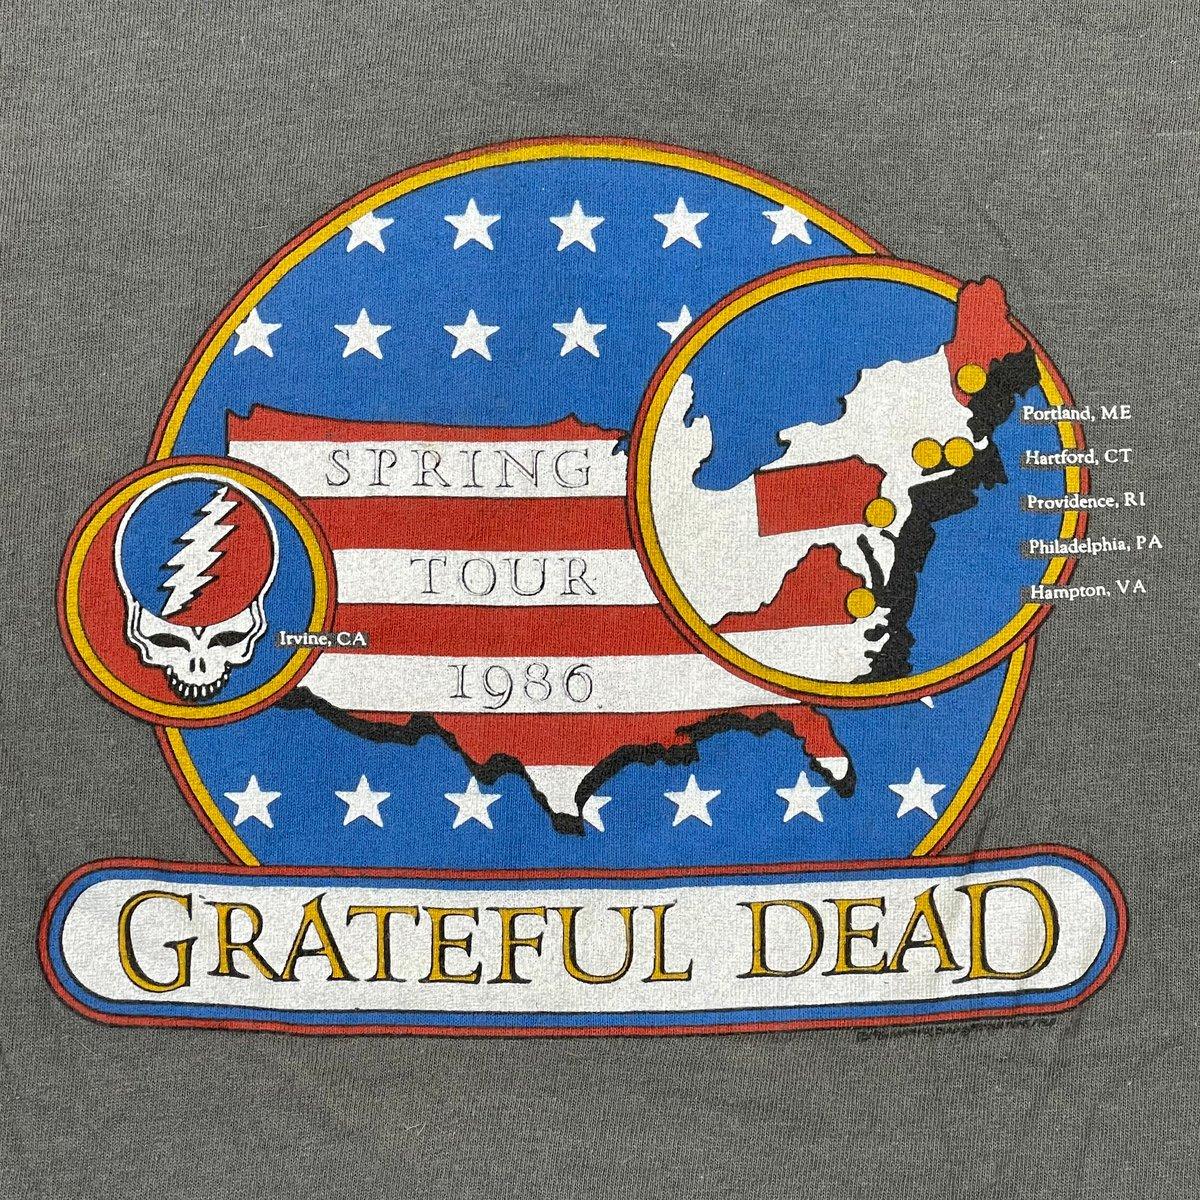 Original Vintage Grateful Dead Spring Tour 1986 Short Sleeve Tee!! - Medium